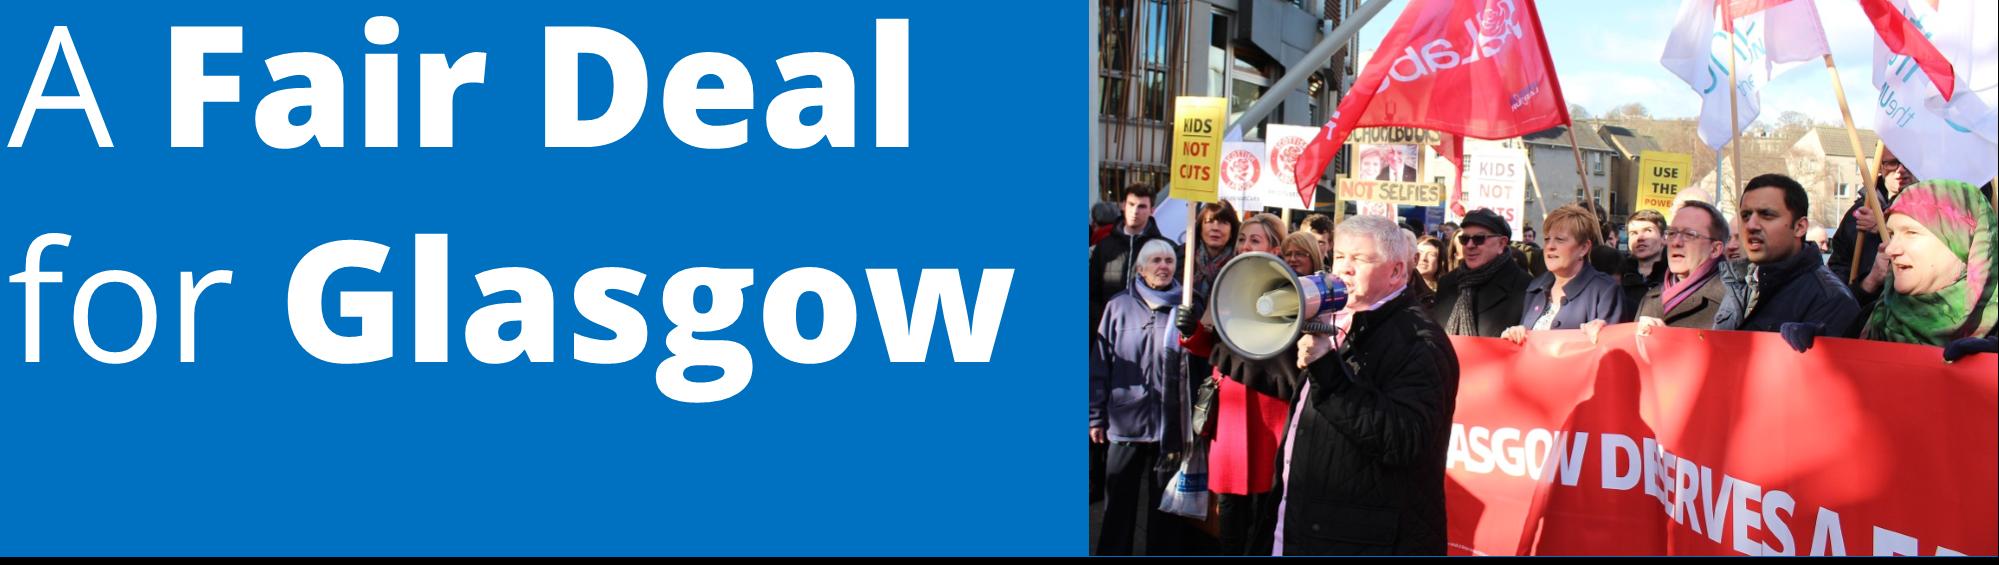 A Fair Deal for Glasgow